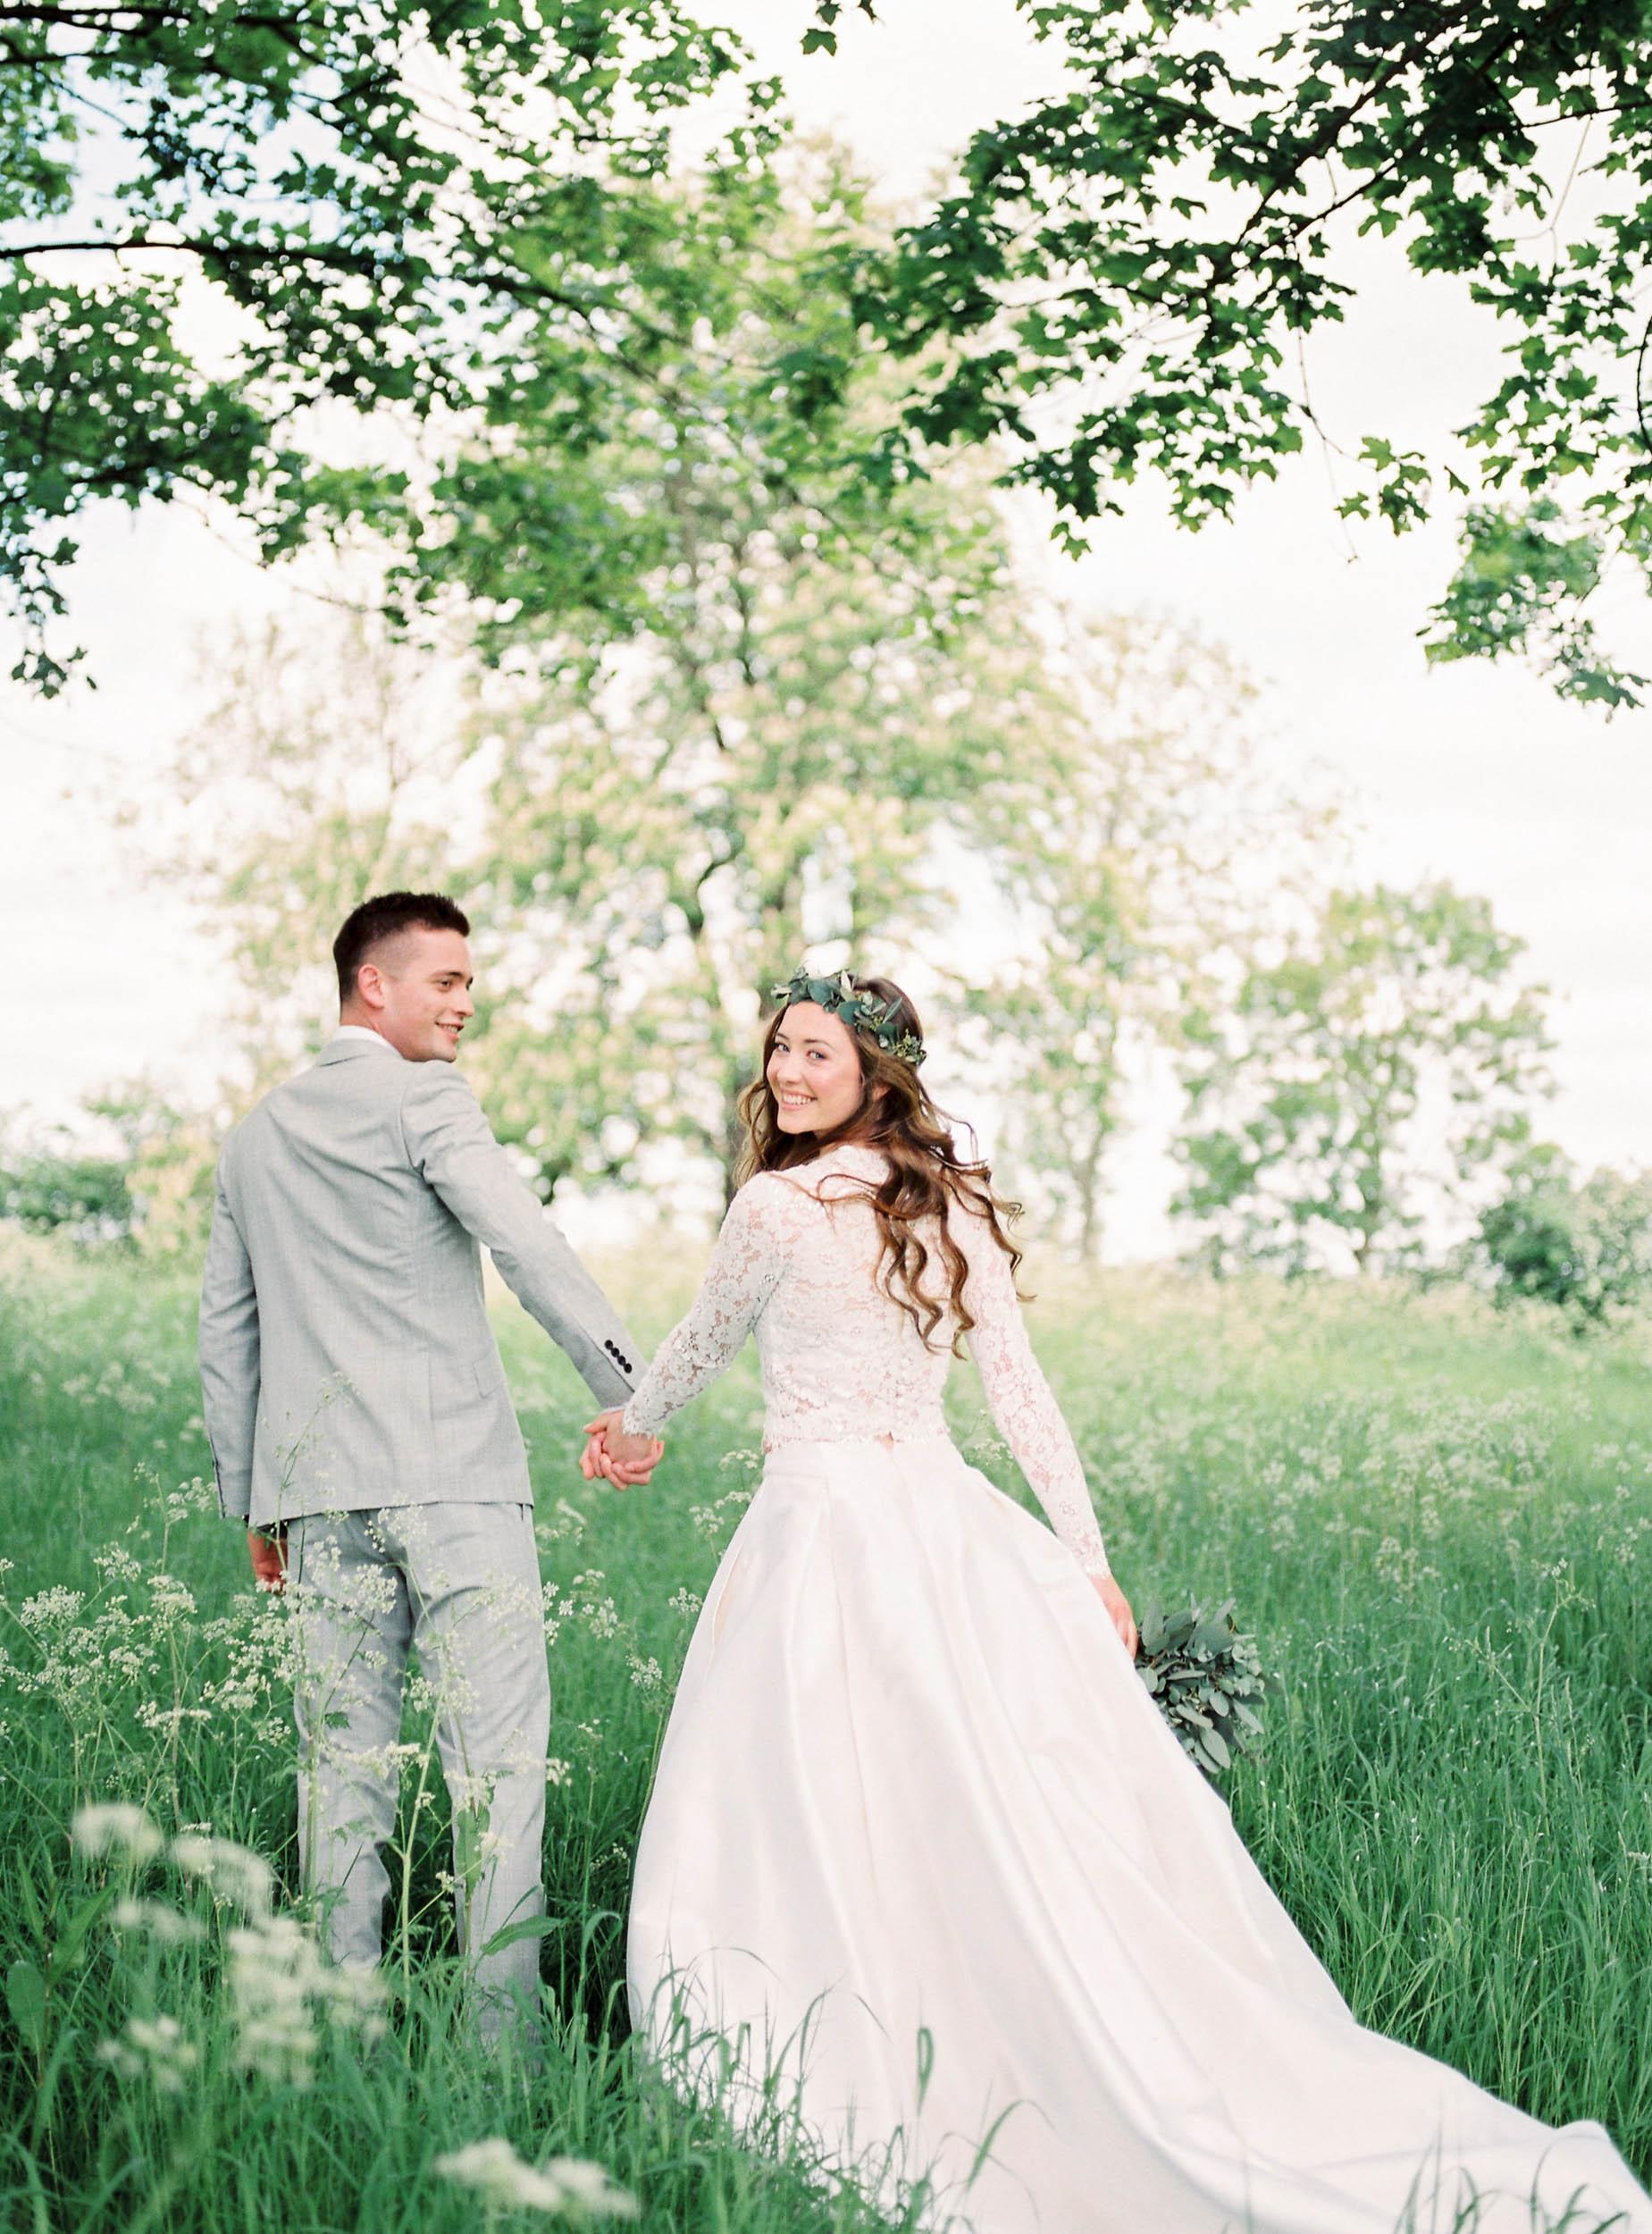 Amy O'Boyle Photography- Destination & UK Fine Art Film Wedding Photographer- Stubton Hall Wedding Shoot-9.jpg